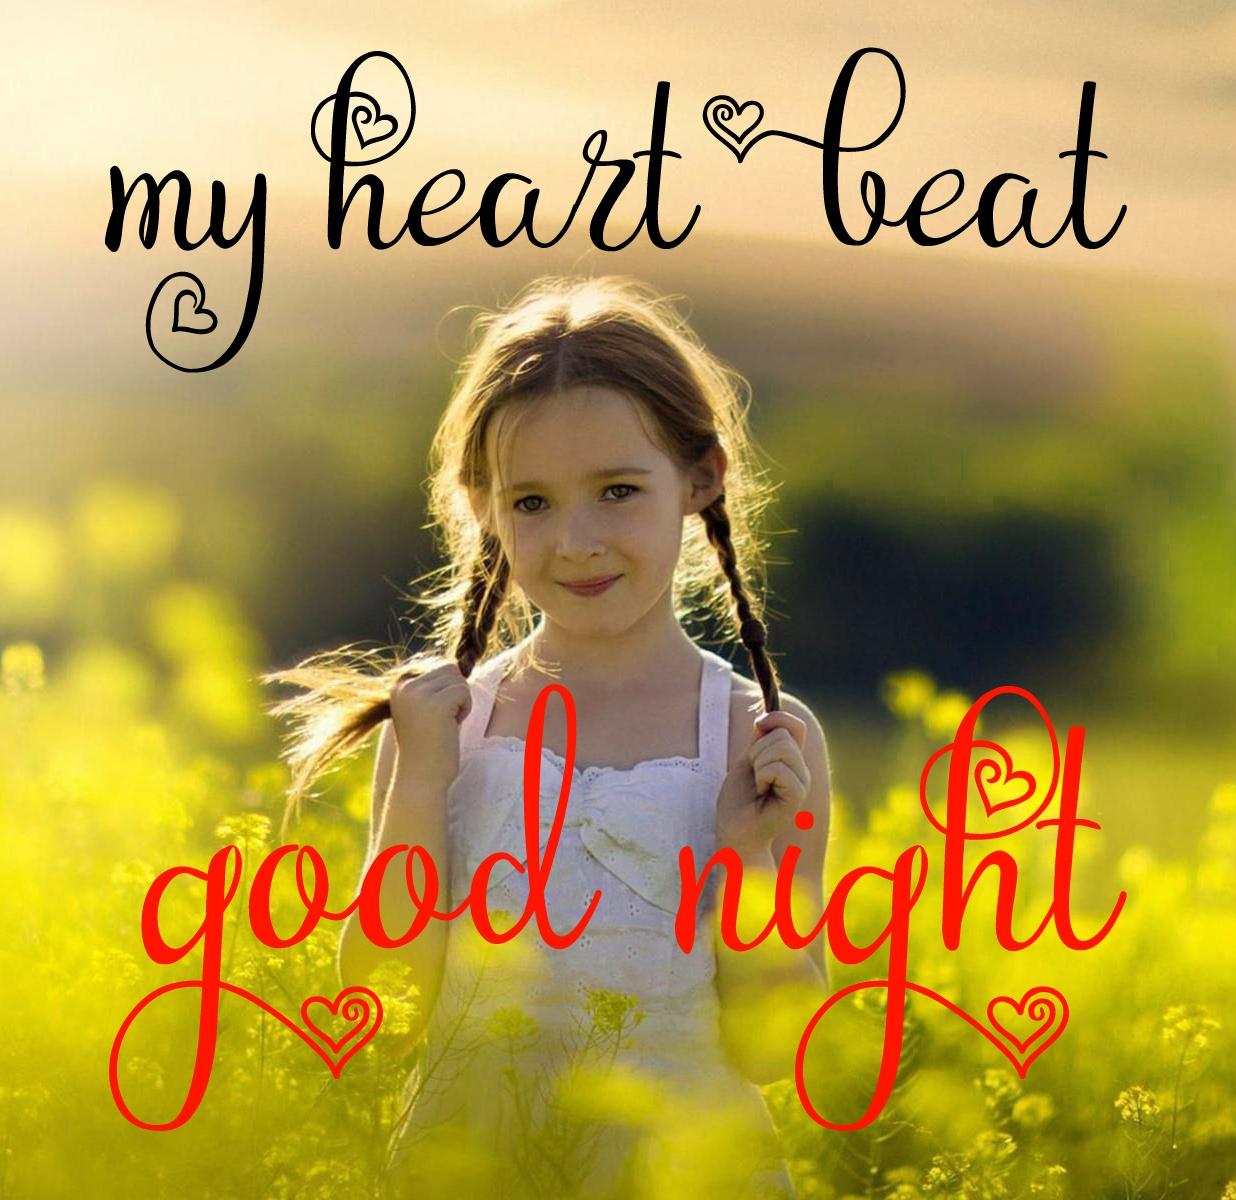 Free good night Images 24